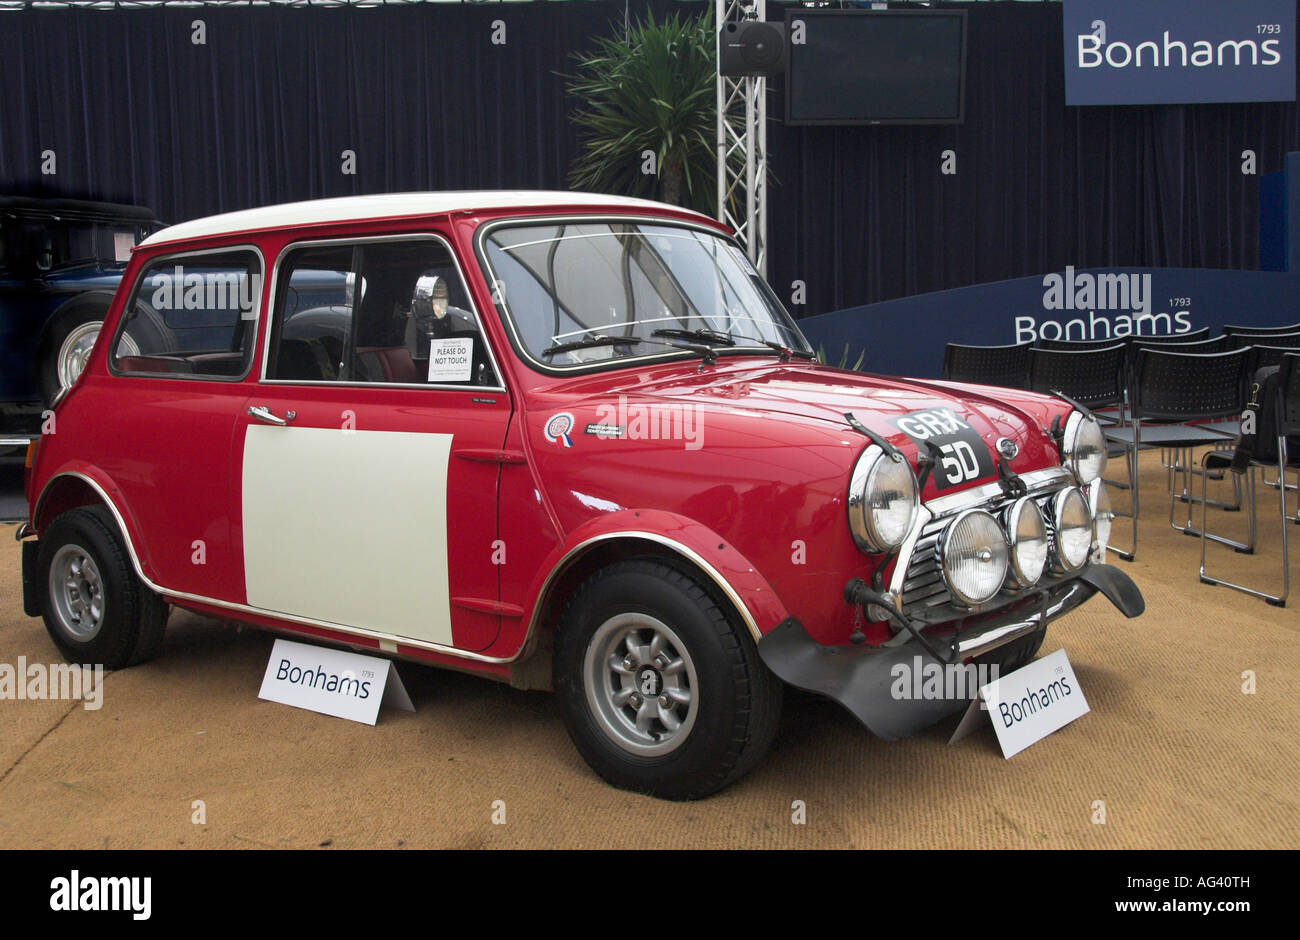 Paddy Hopkirk 1967 Circuit of Ireland winner 1966 Austin Mini Cooper S Goodwood Sussex England 2007 Stock Photo